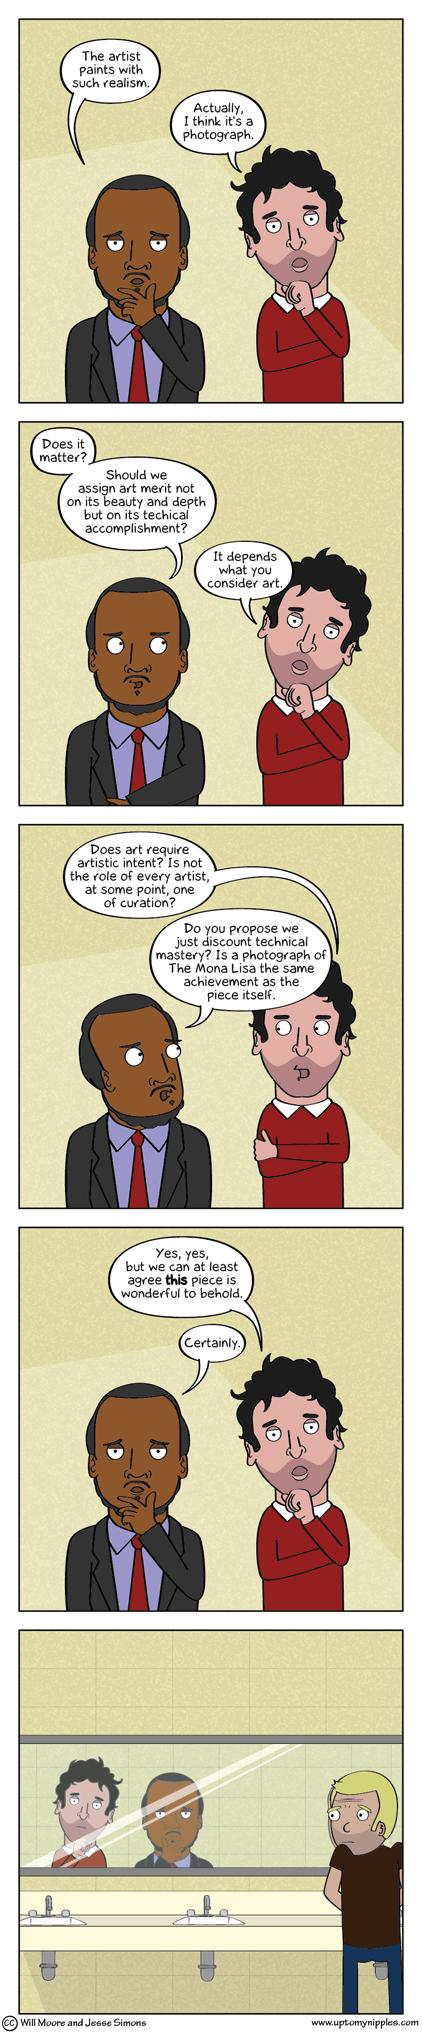 The Artful Dodgers comic